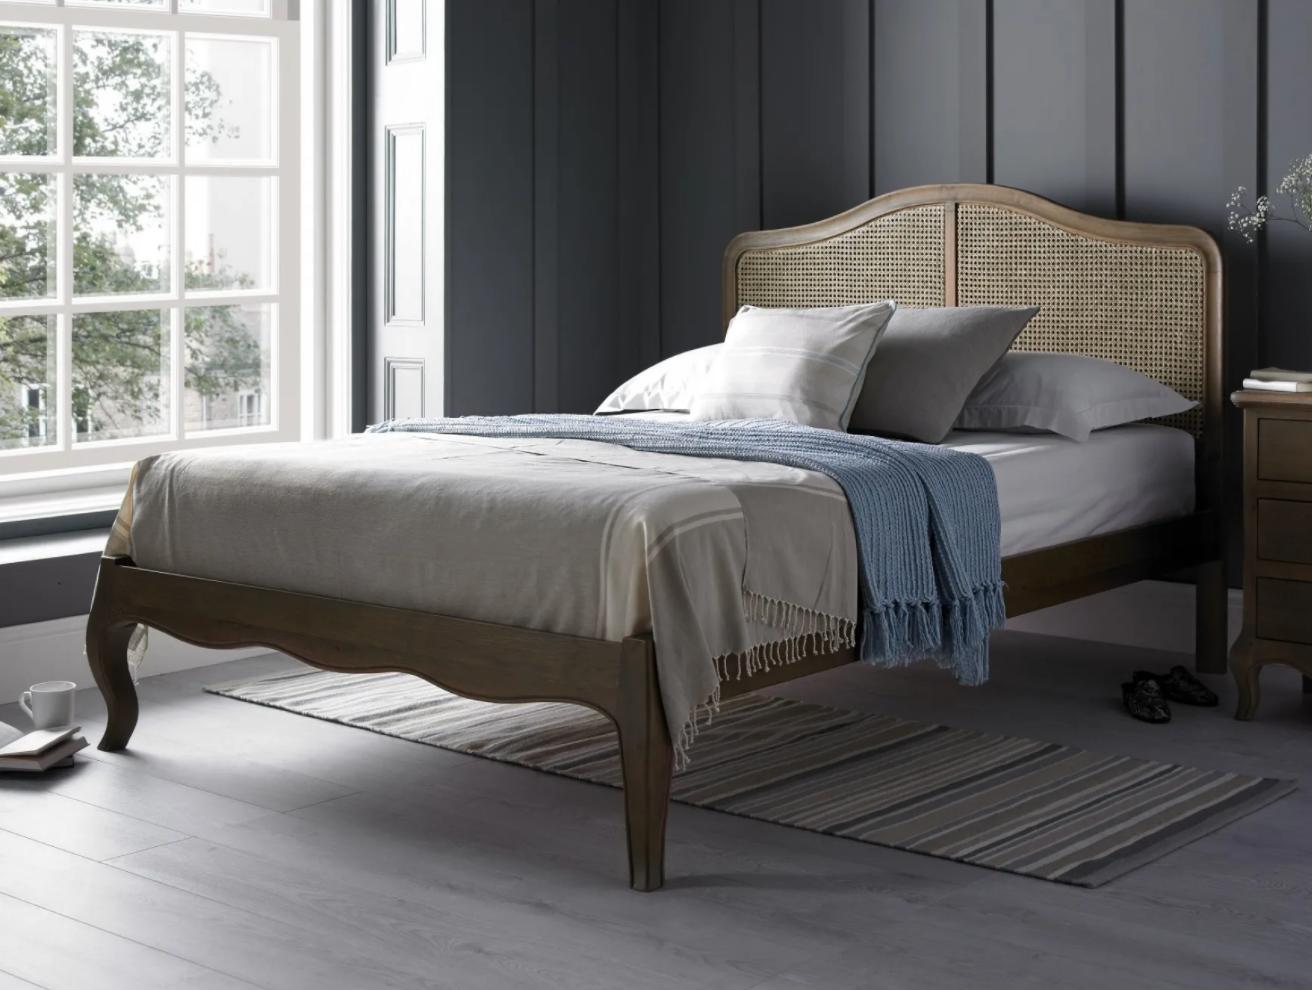 loire rattan bed